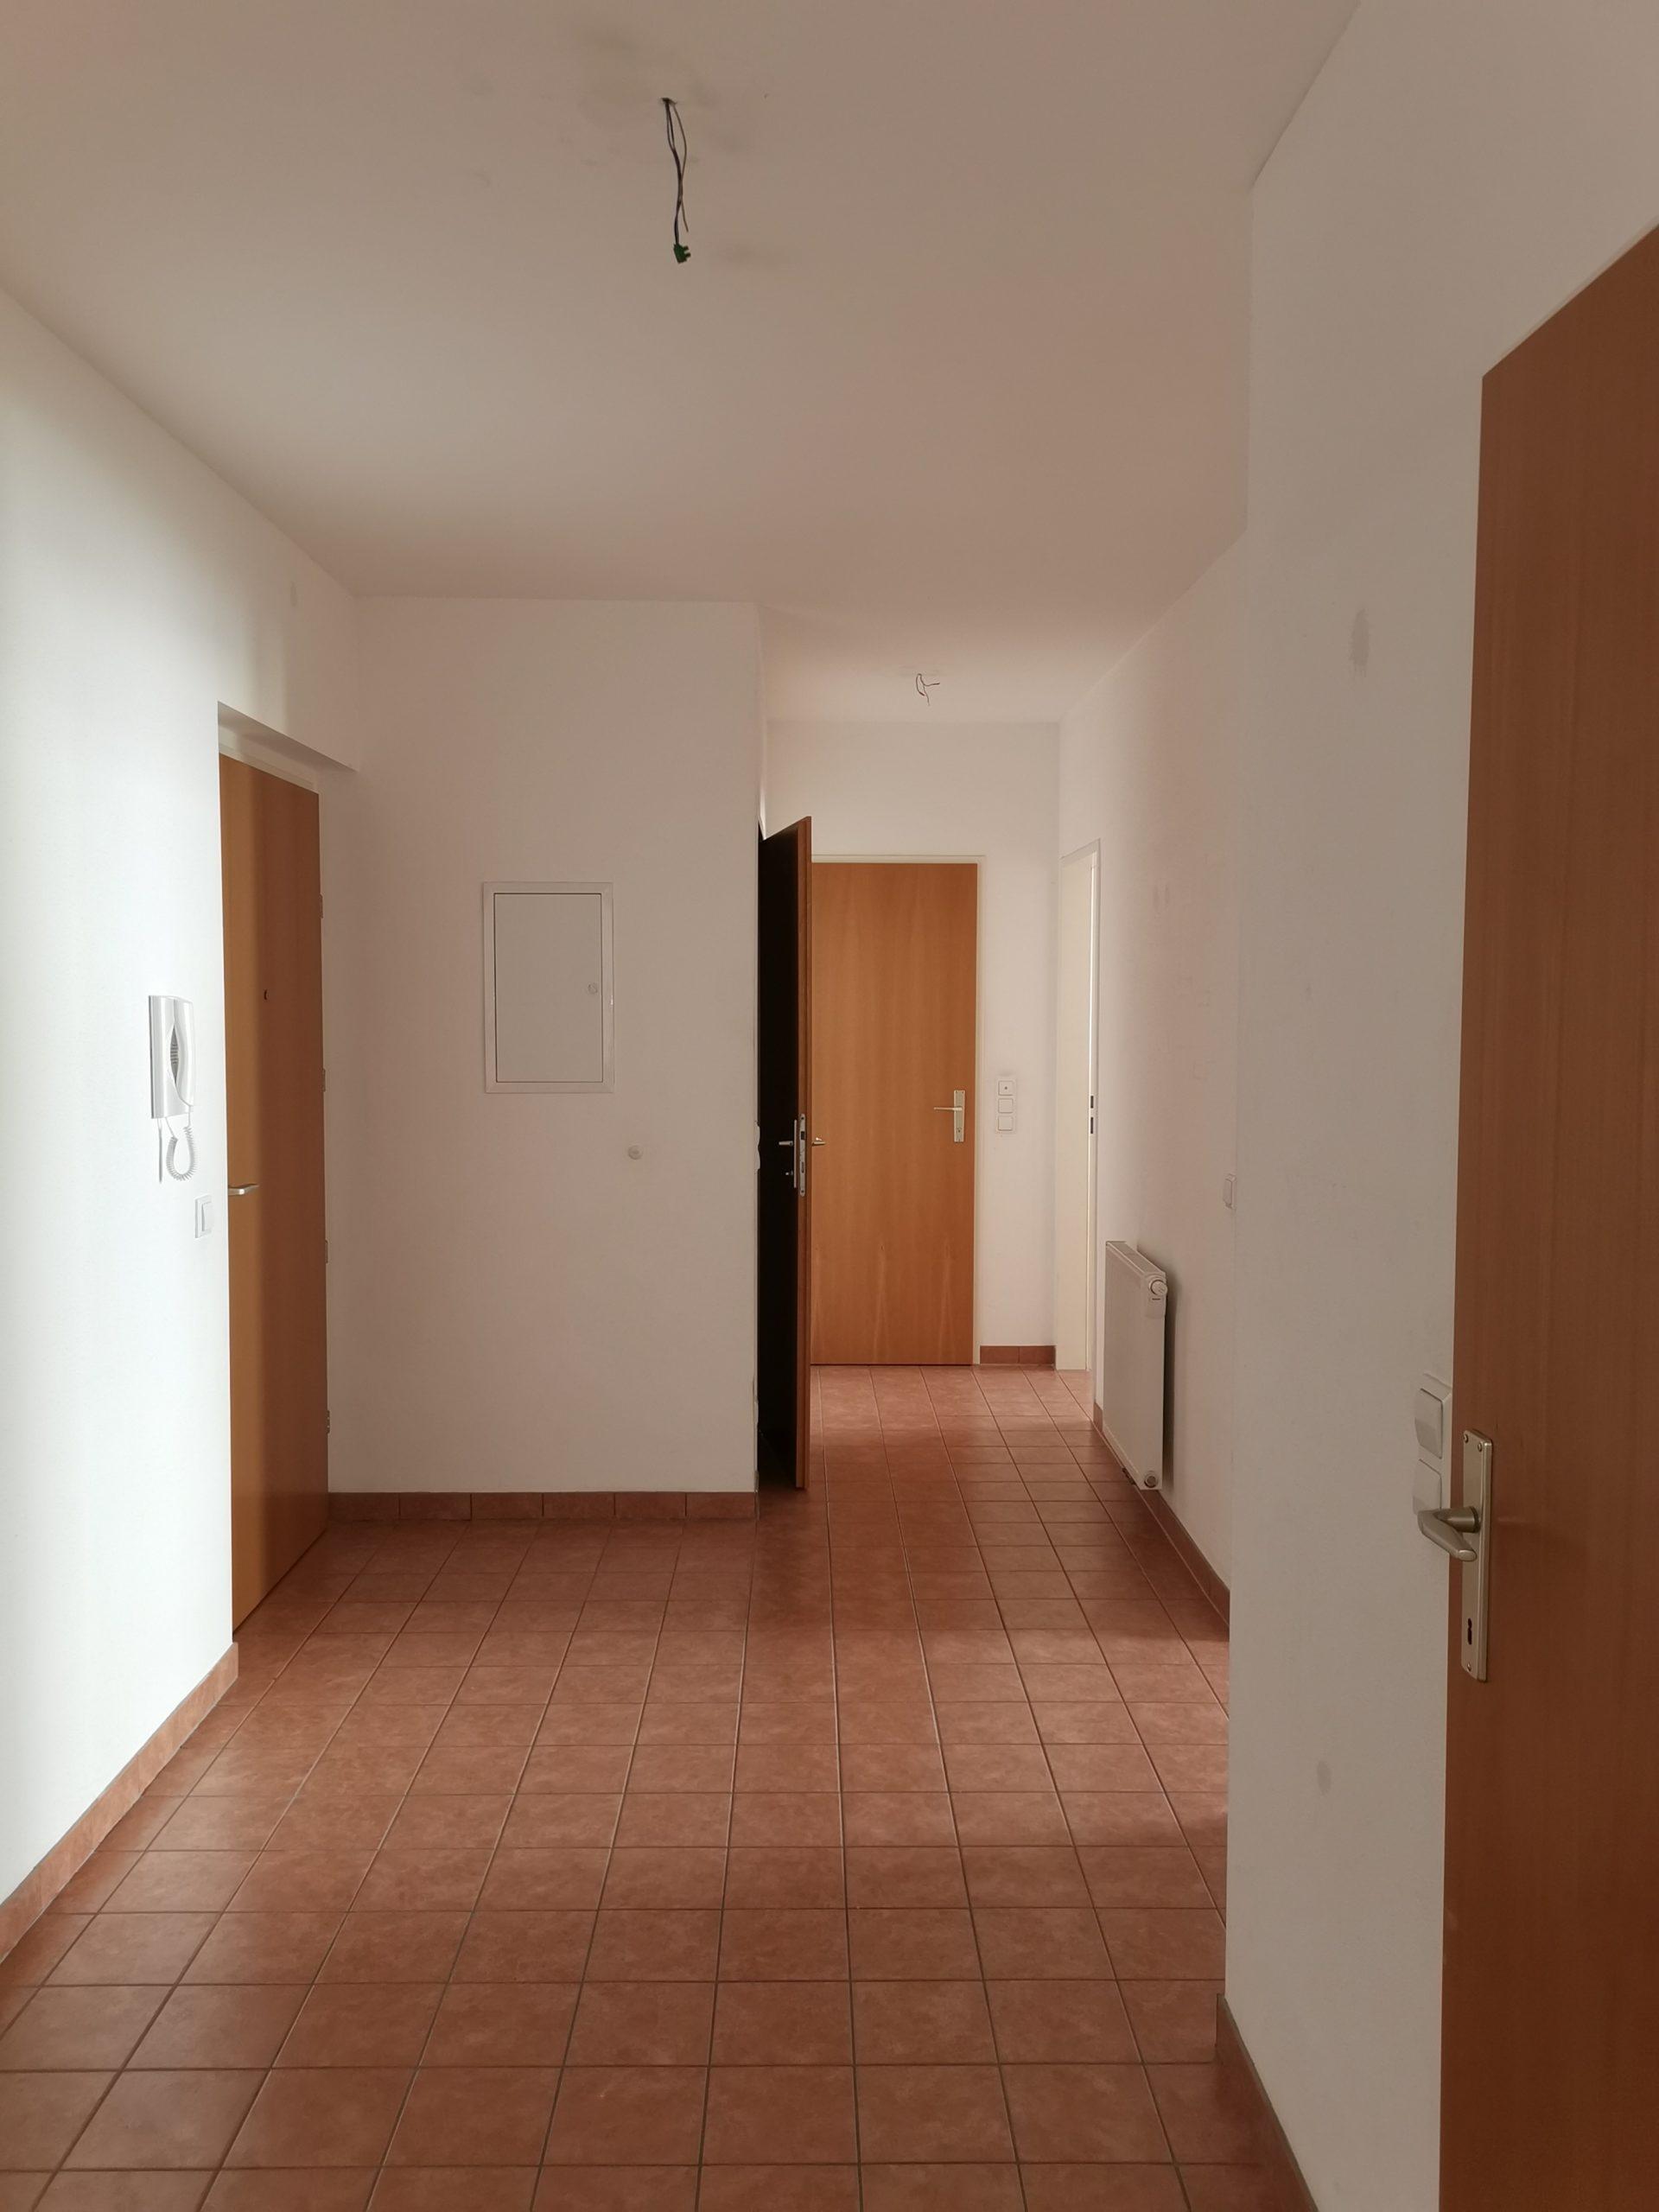 Immobilie von Kamptal in 3580 Horn, Horn, Horn VI/2 - Top 206 #4